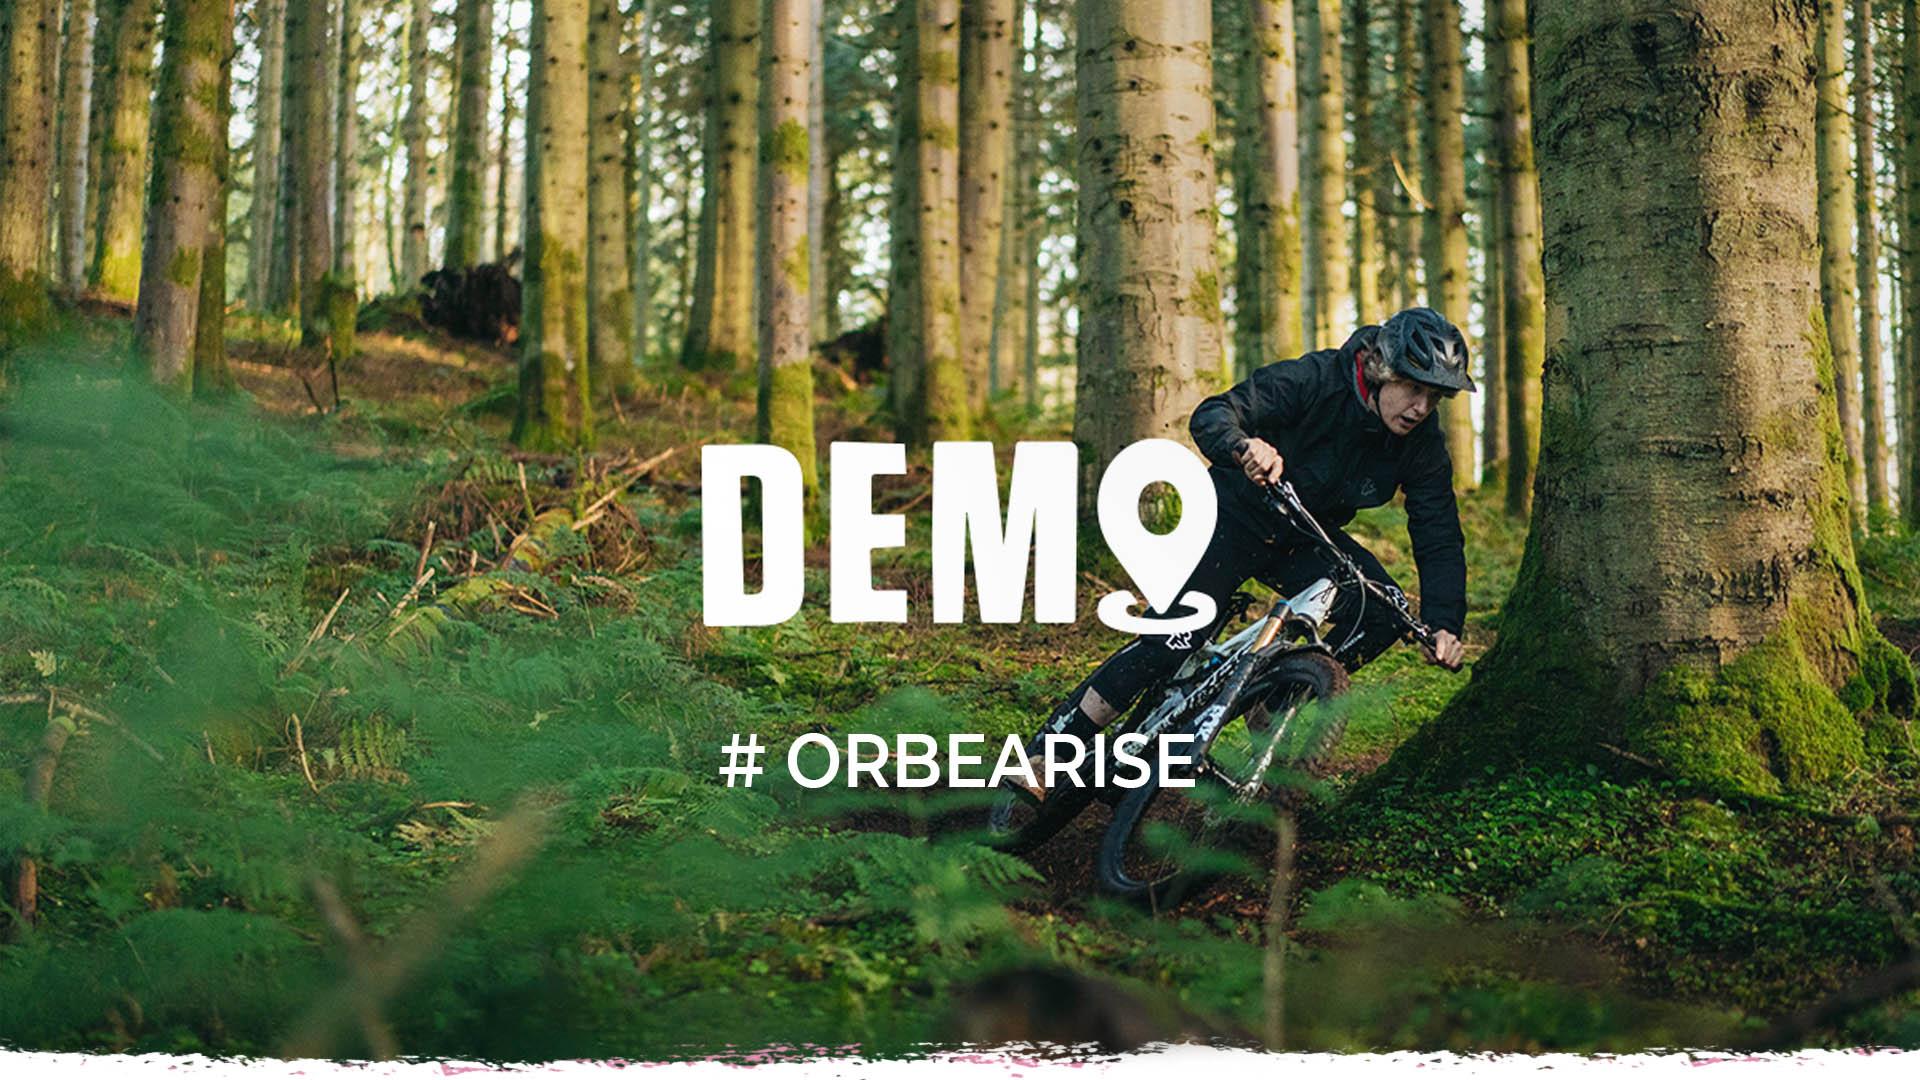 DEMO ORBEA RISE